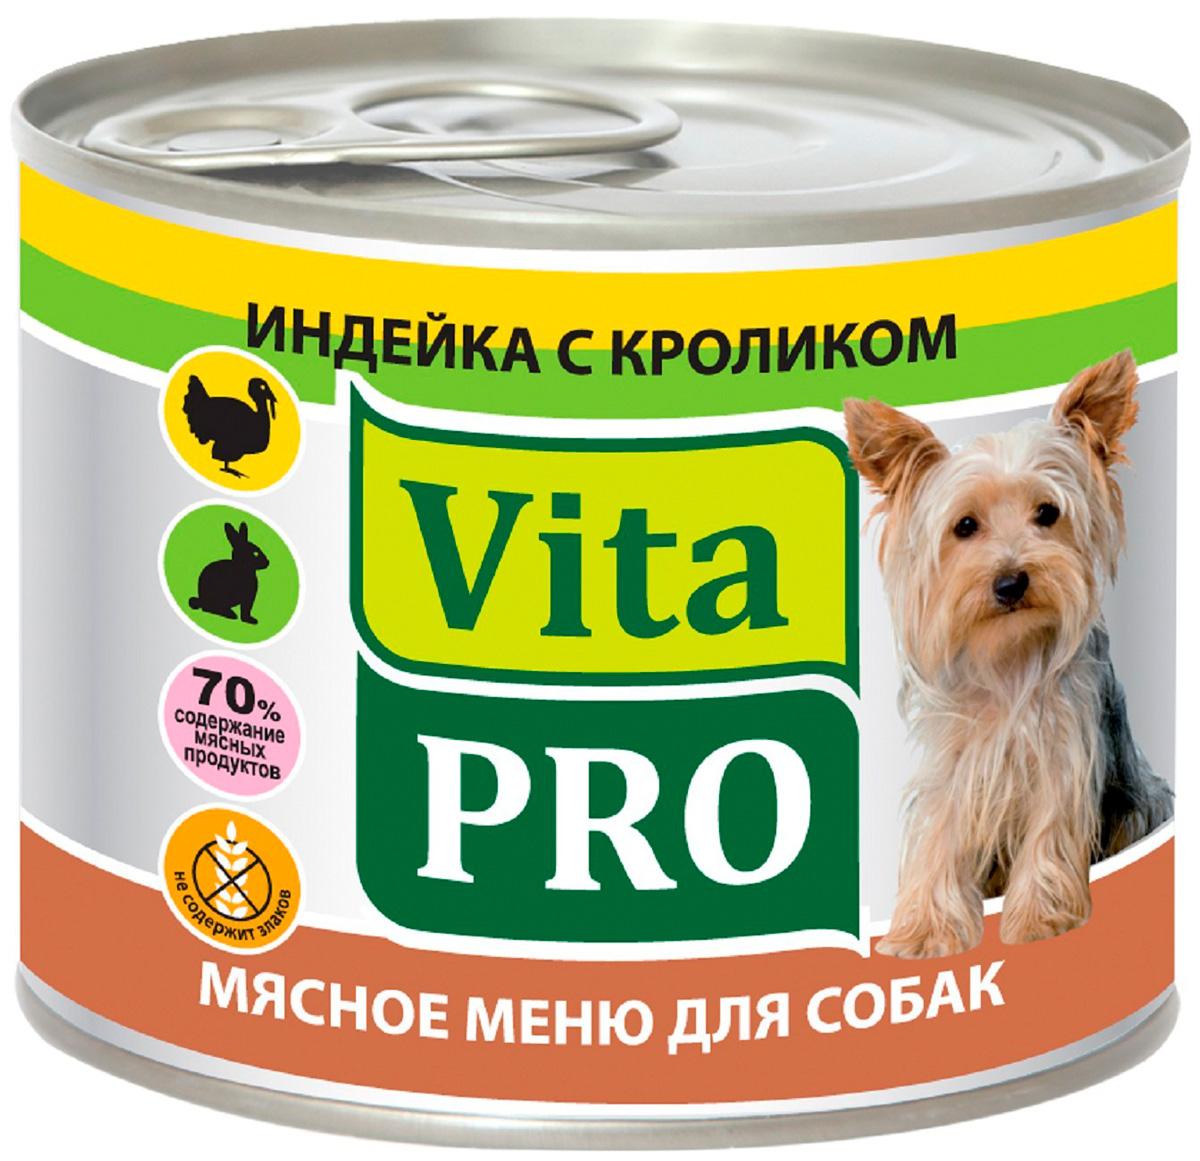 Фото - Vita Pro мясное меню для взрослых собак с индейкой и кроликом 200 гр (200 гр х 6 шт) vita pro мясное меню для взрослых собак с индейкой и кроликом 200 гр 200 гр х 6 шт